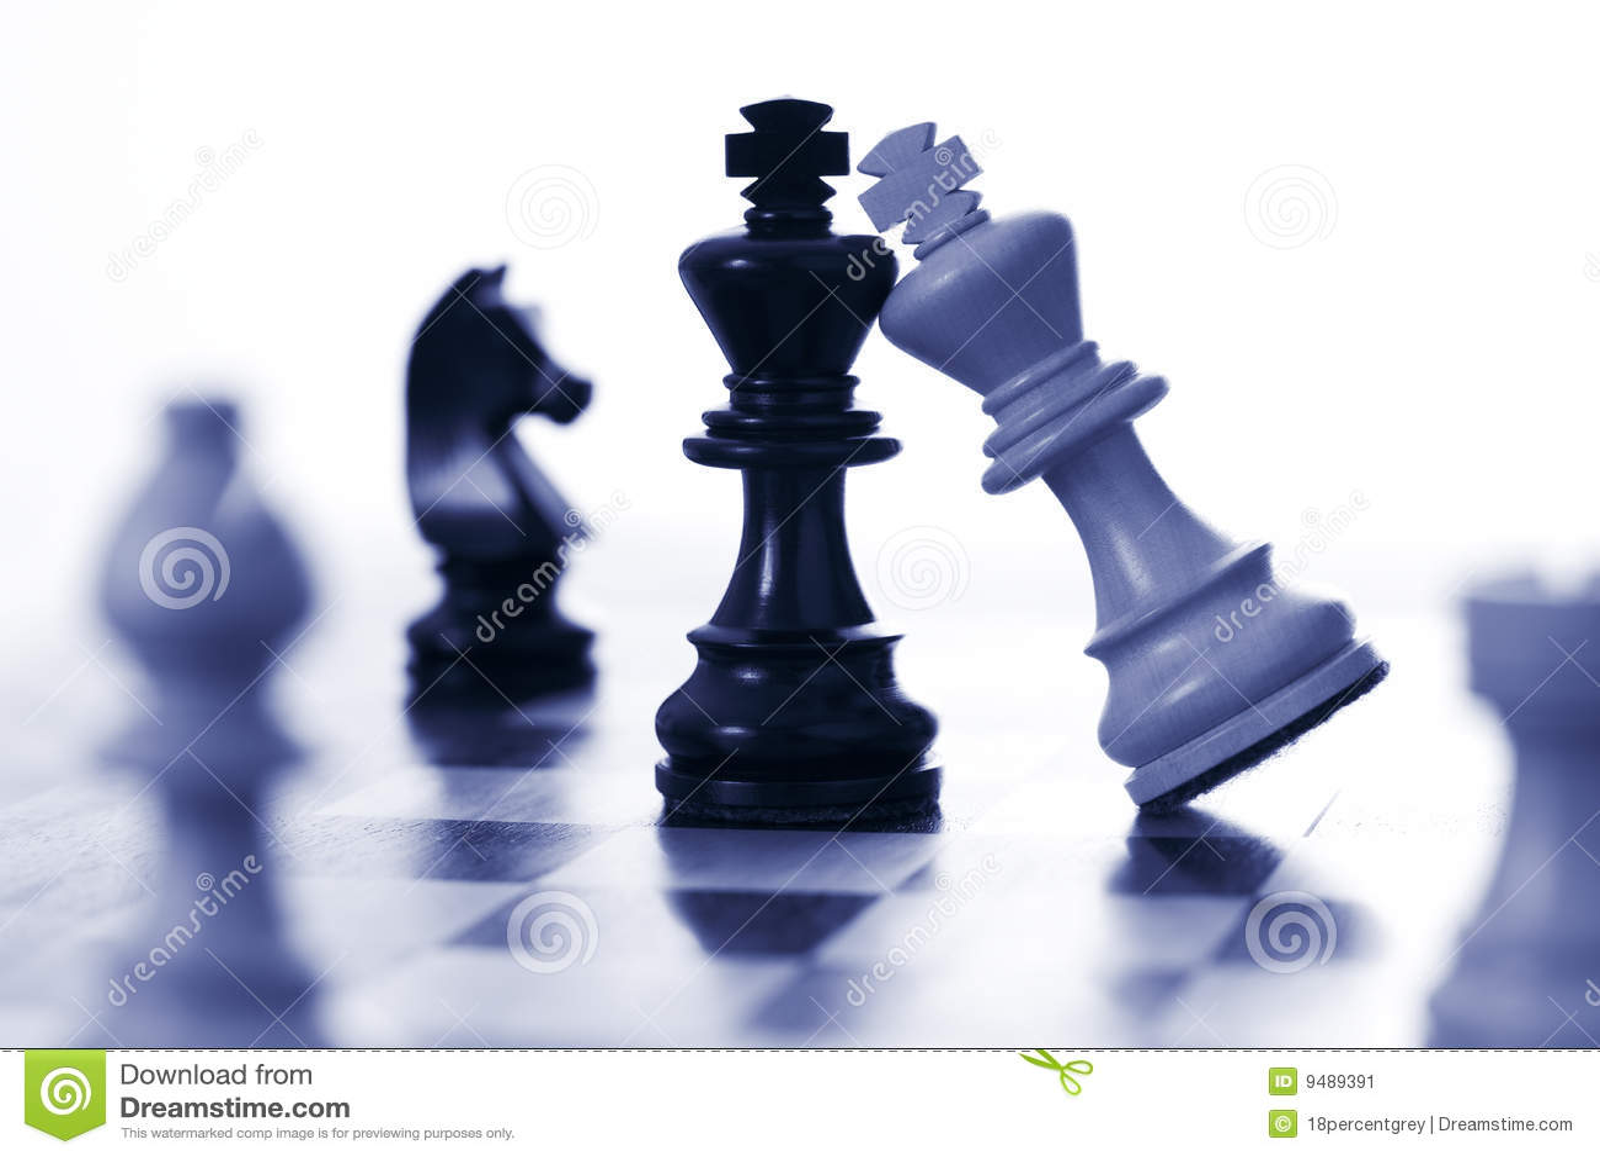 Chess white king attacks black king